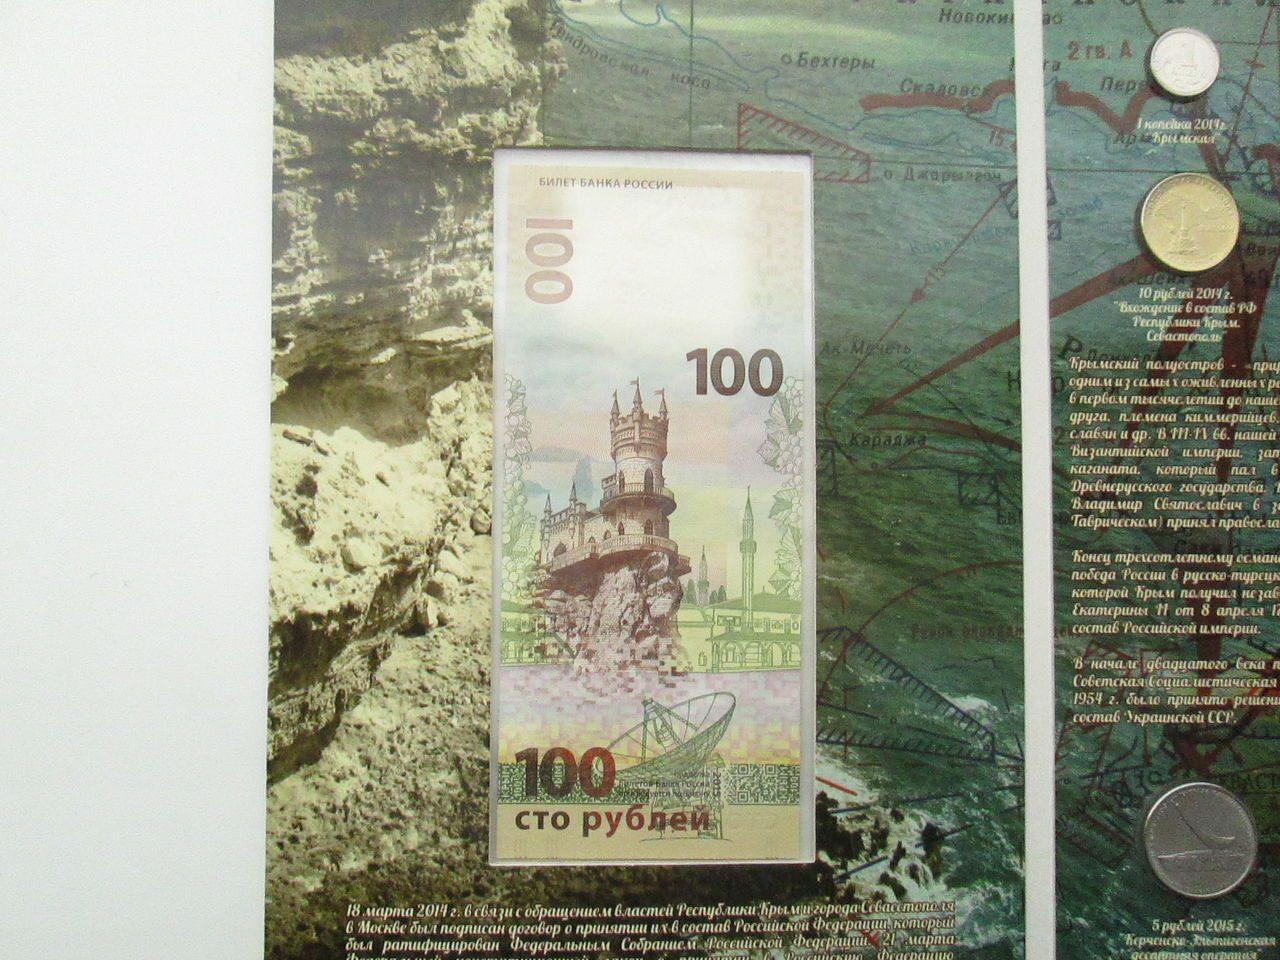 eesti vabariik 20 senti 1992 цена продать